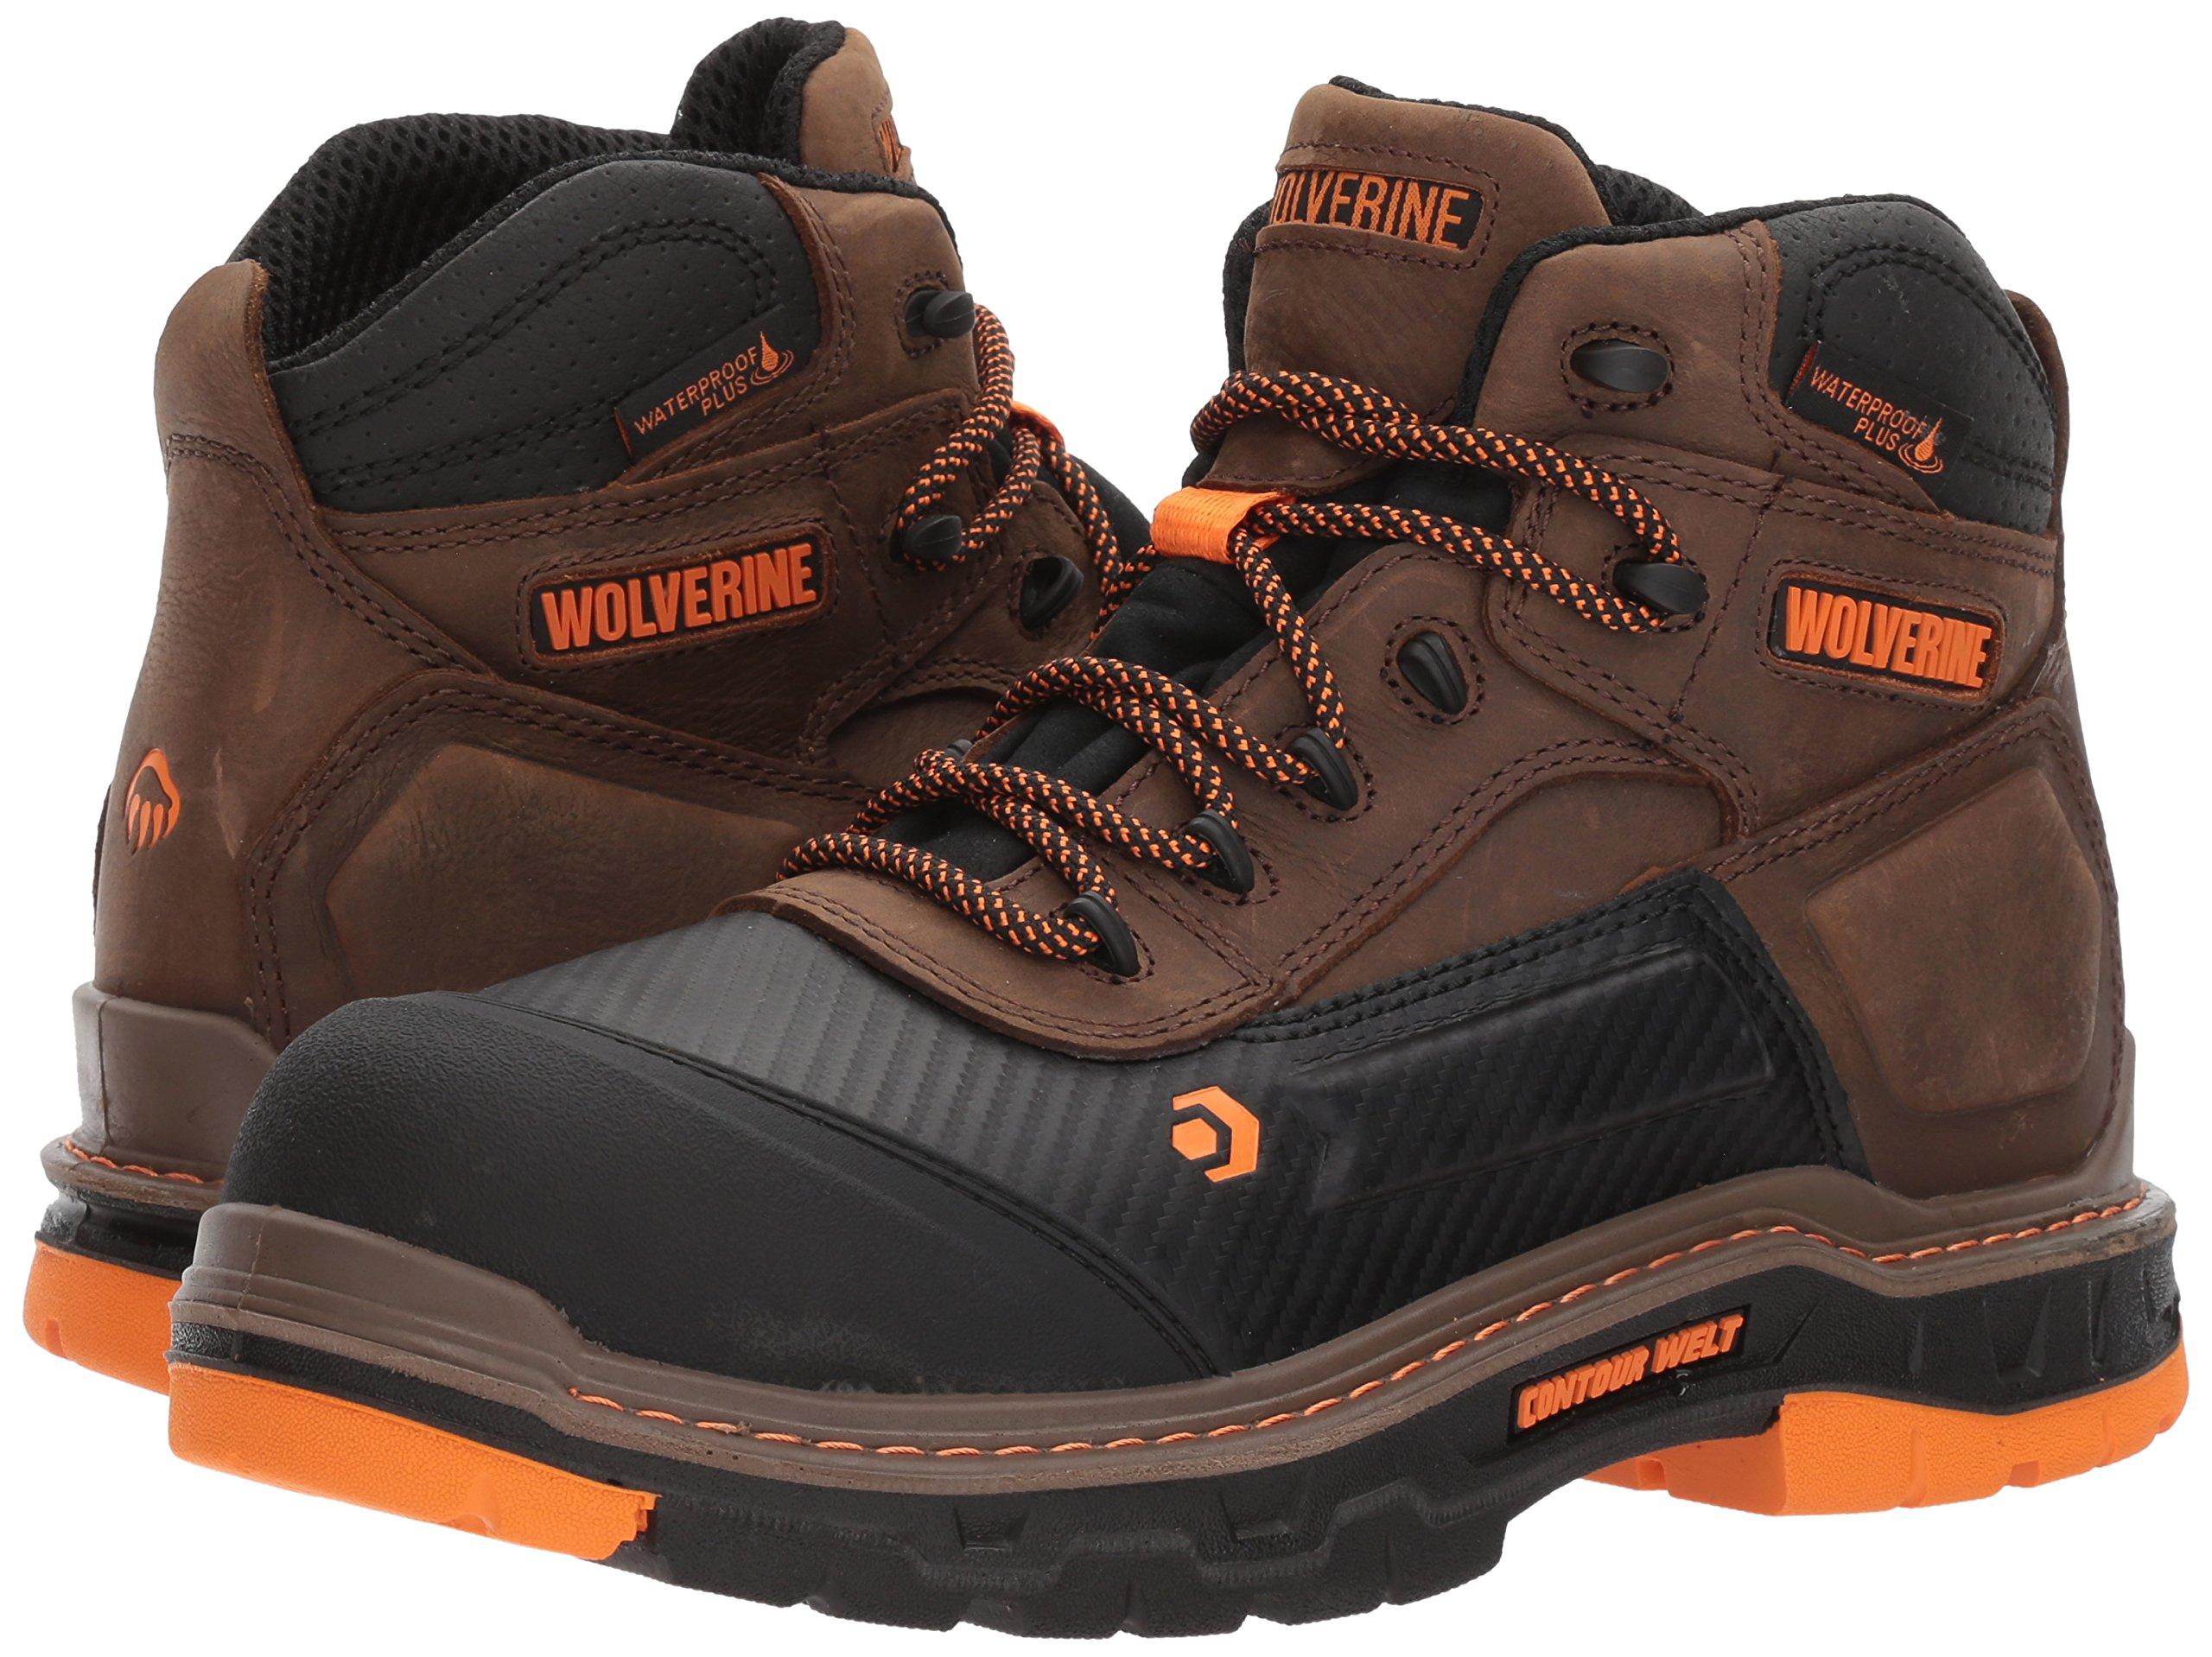 Wolverine Men's Overpass 6'' Composite Toe Waterproof Work Boot, Summer Brown, 10.5 M US by Wolverine (Image #6)